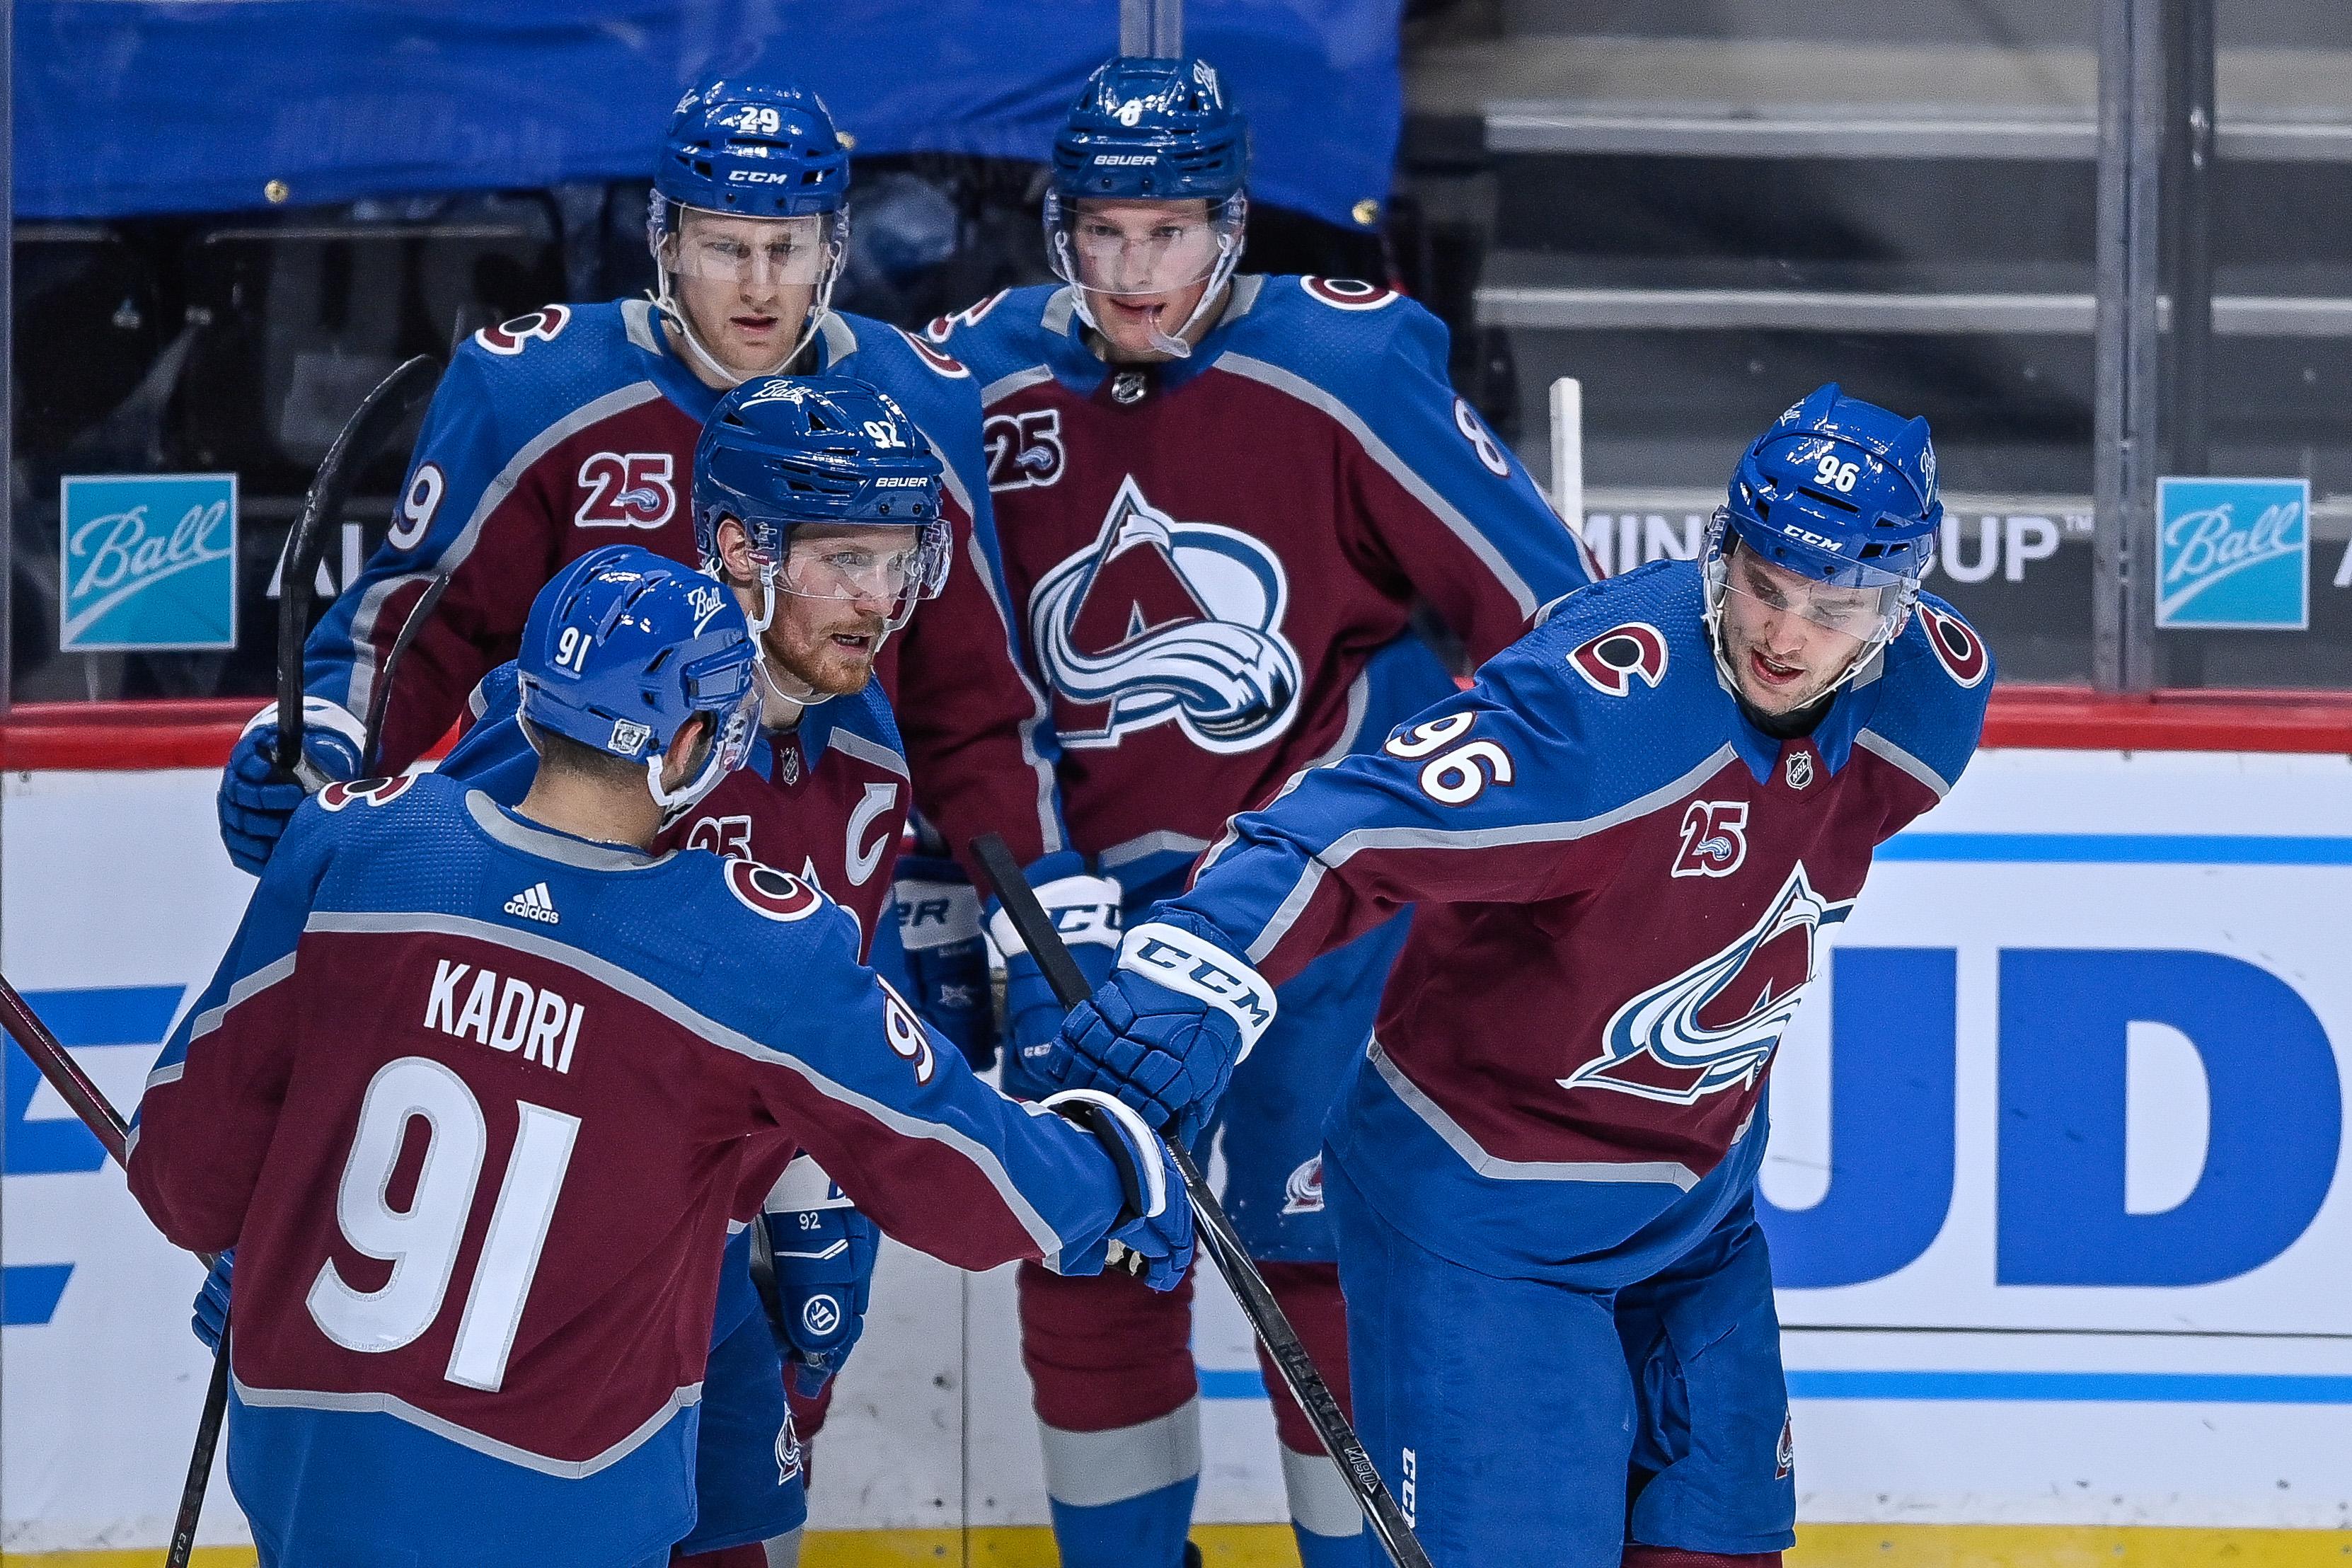 NHL: JAN 26 Sharks at Avalanche